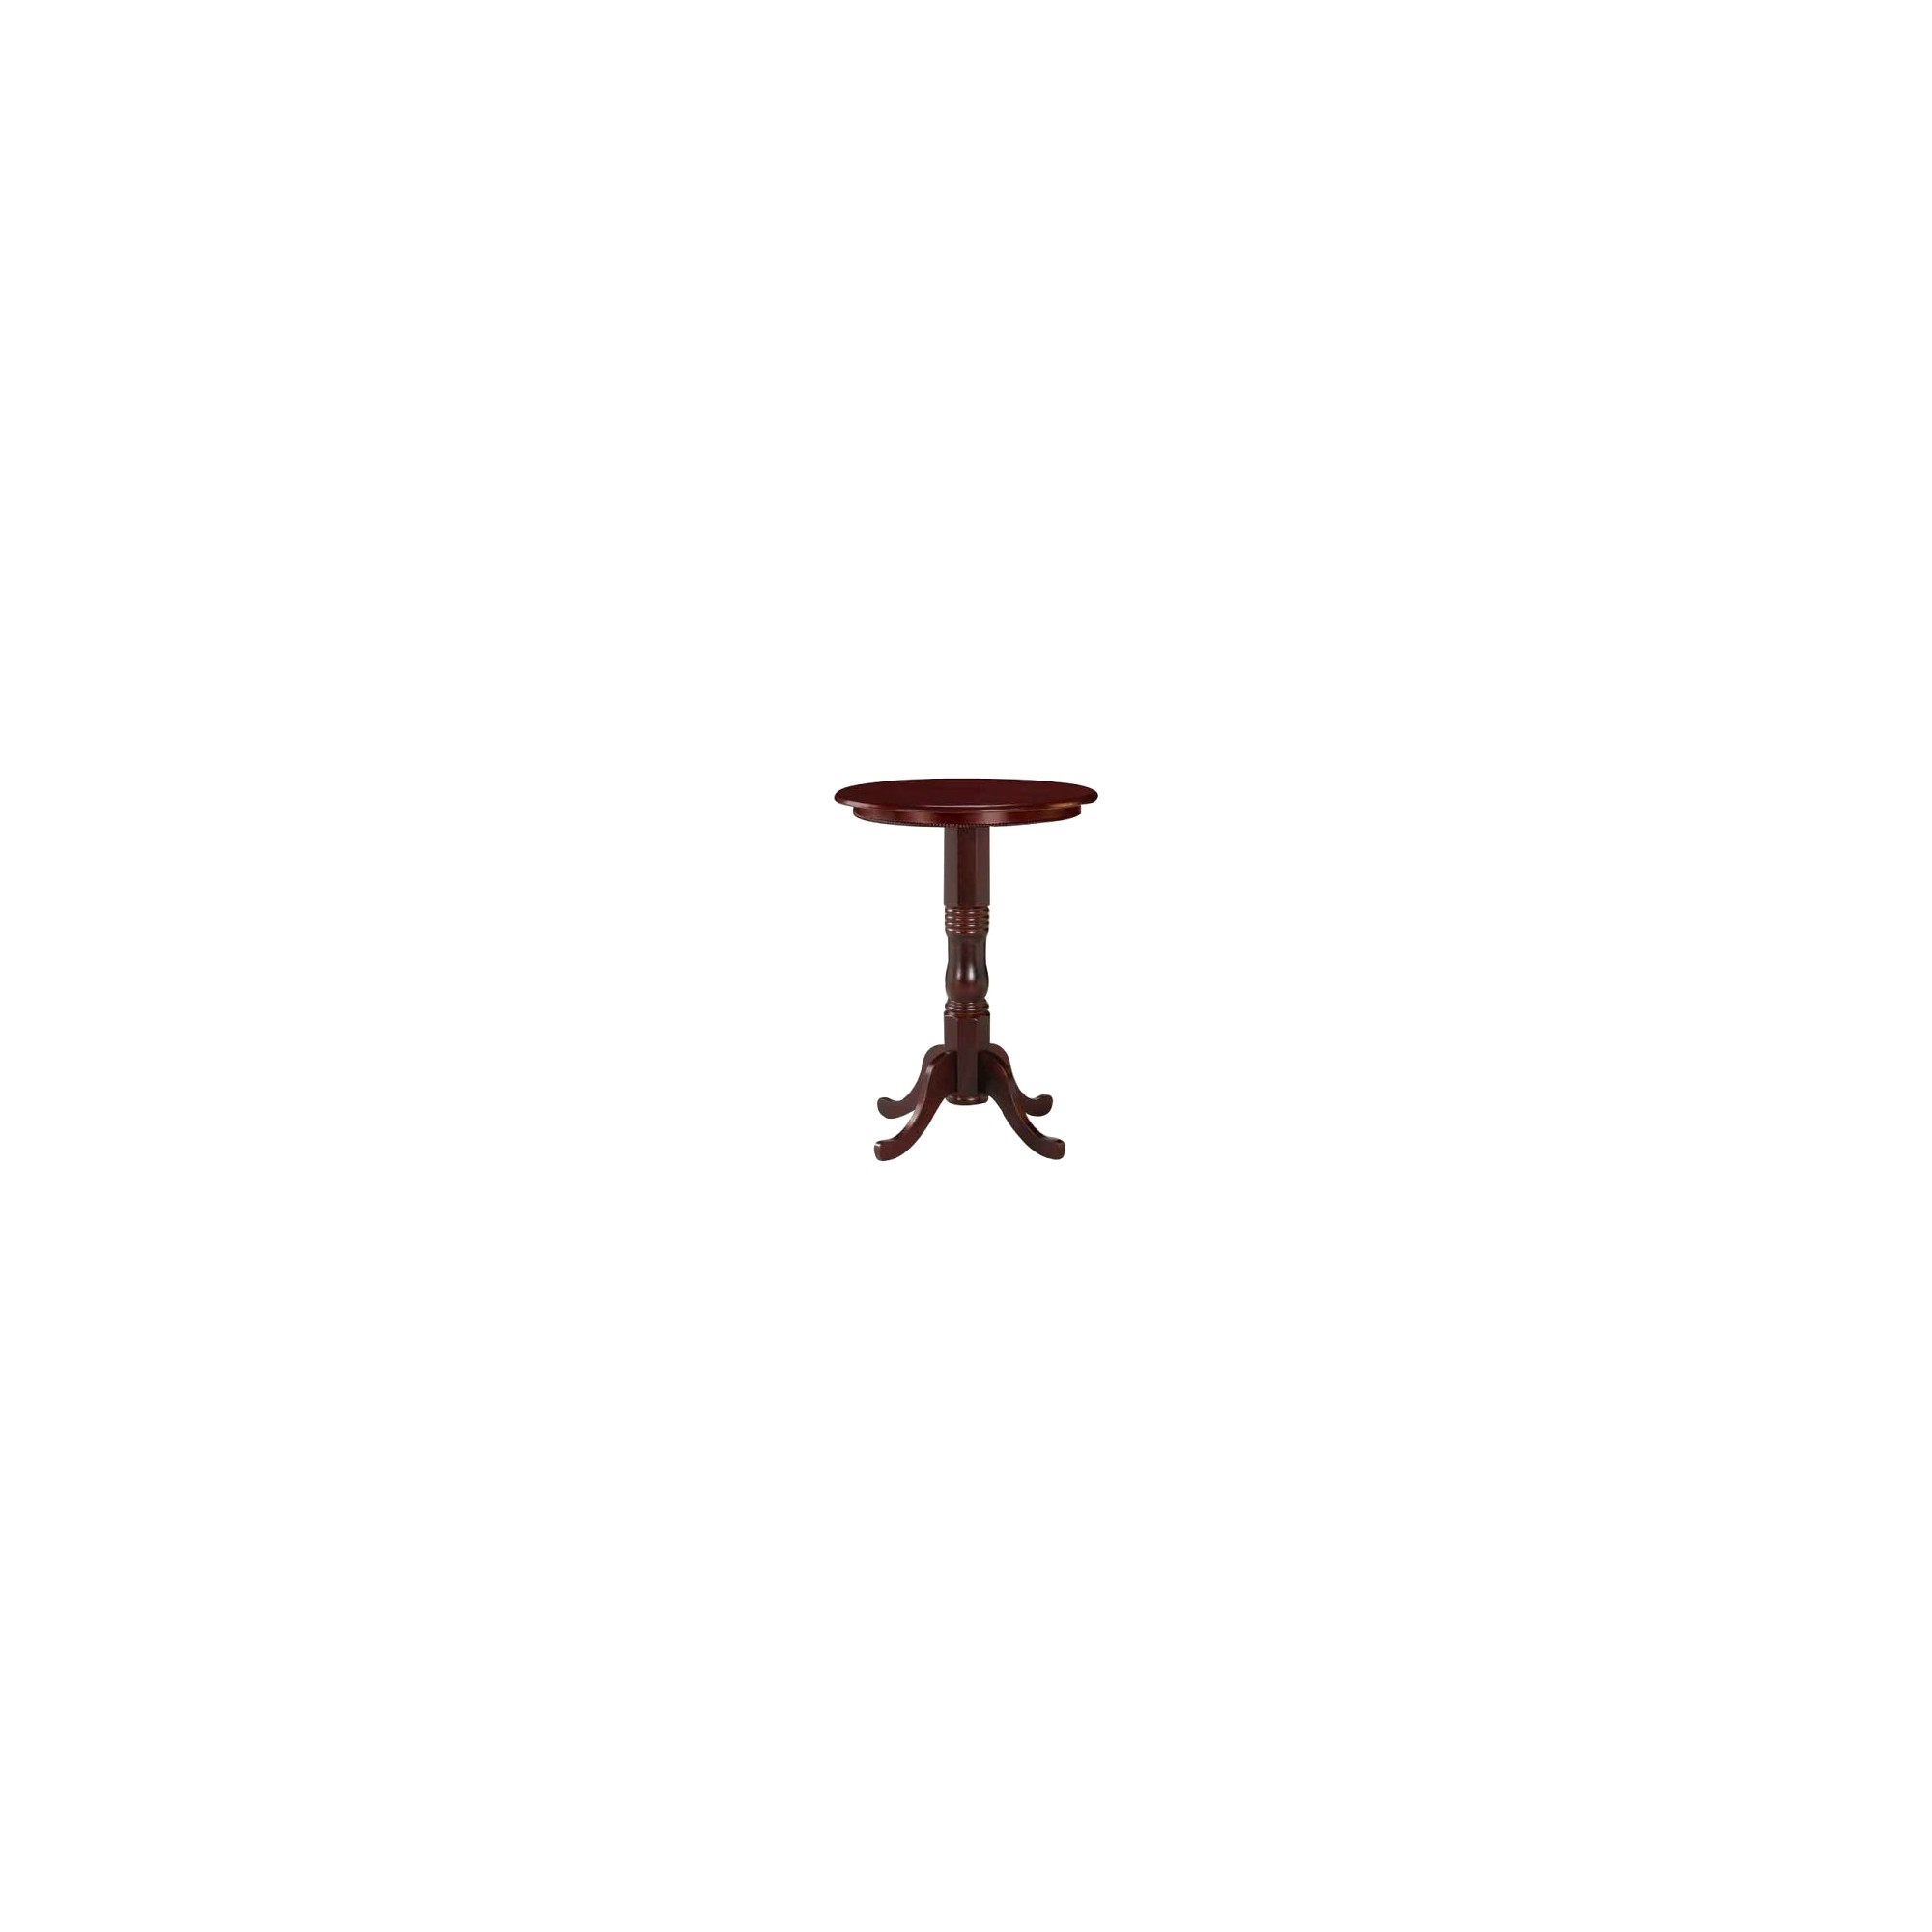 Round Pedestal Pub Table Wood/Cherry - Boraam Industries